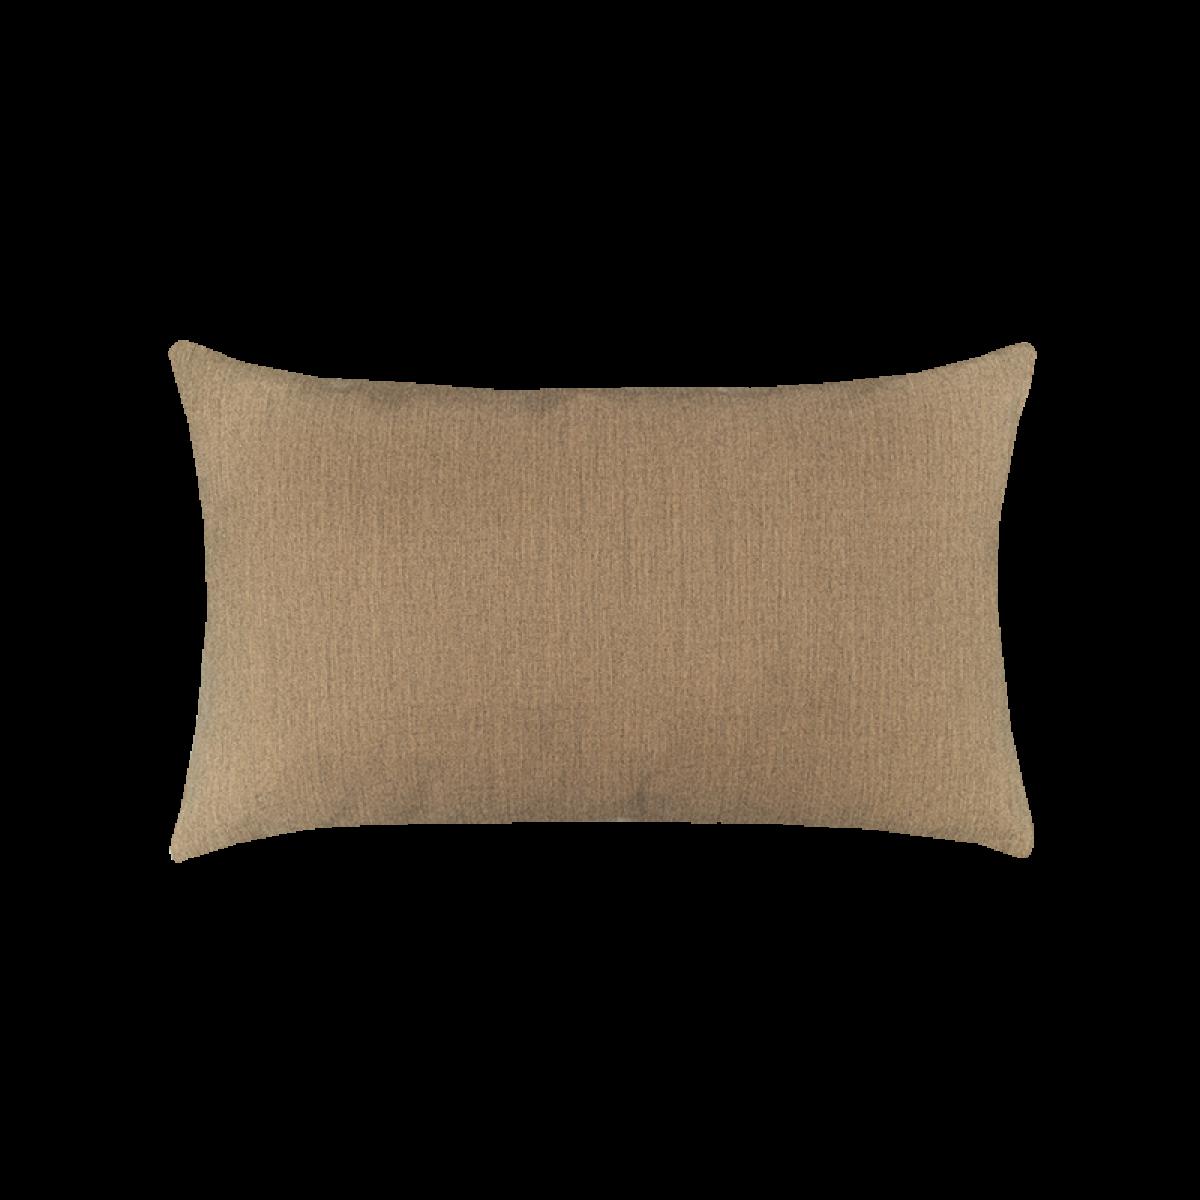 Canvas Heather Beige Essentials Lumbar Pillow